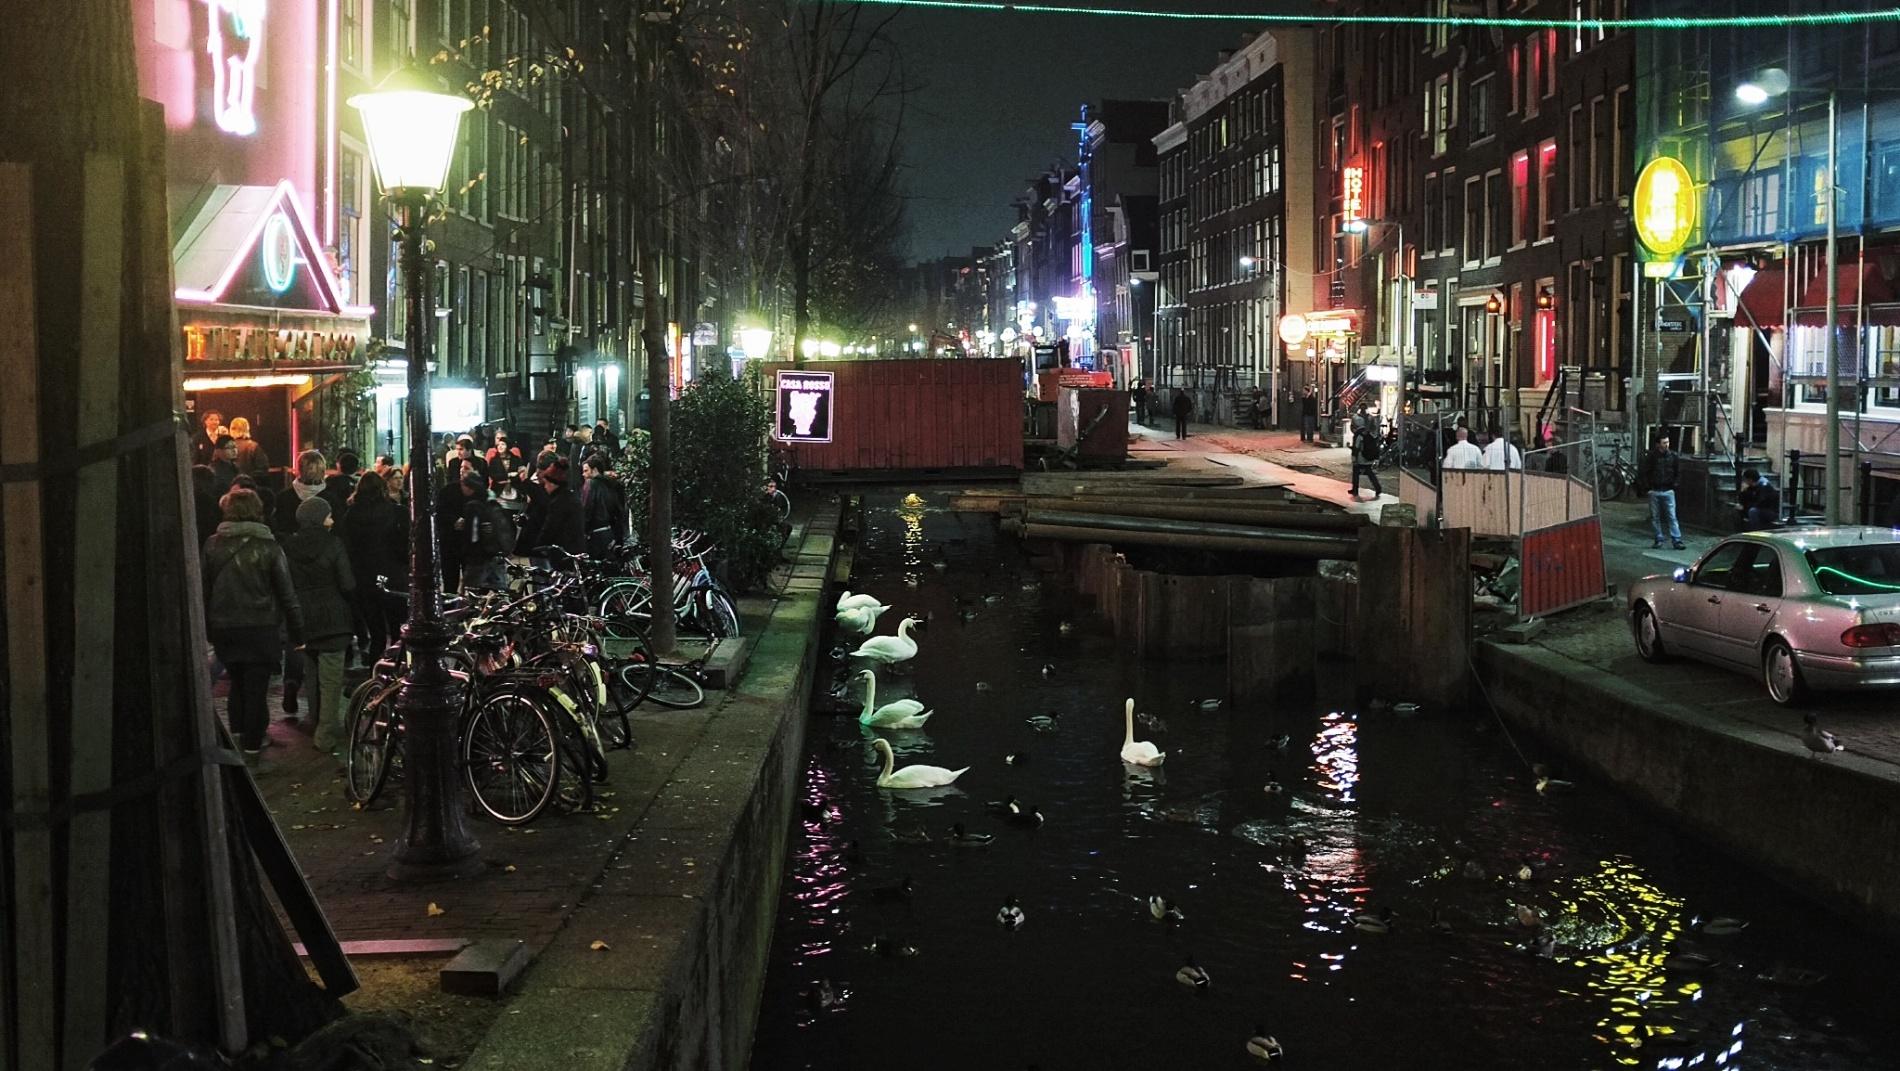 2011-11-07 at 09-31-51, Amsterdam.jpg